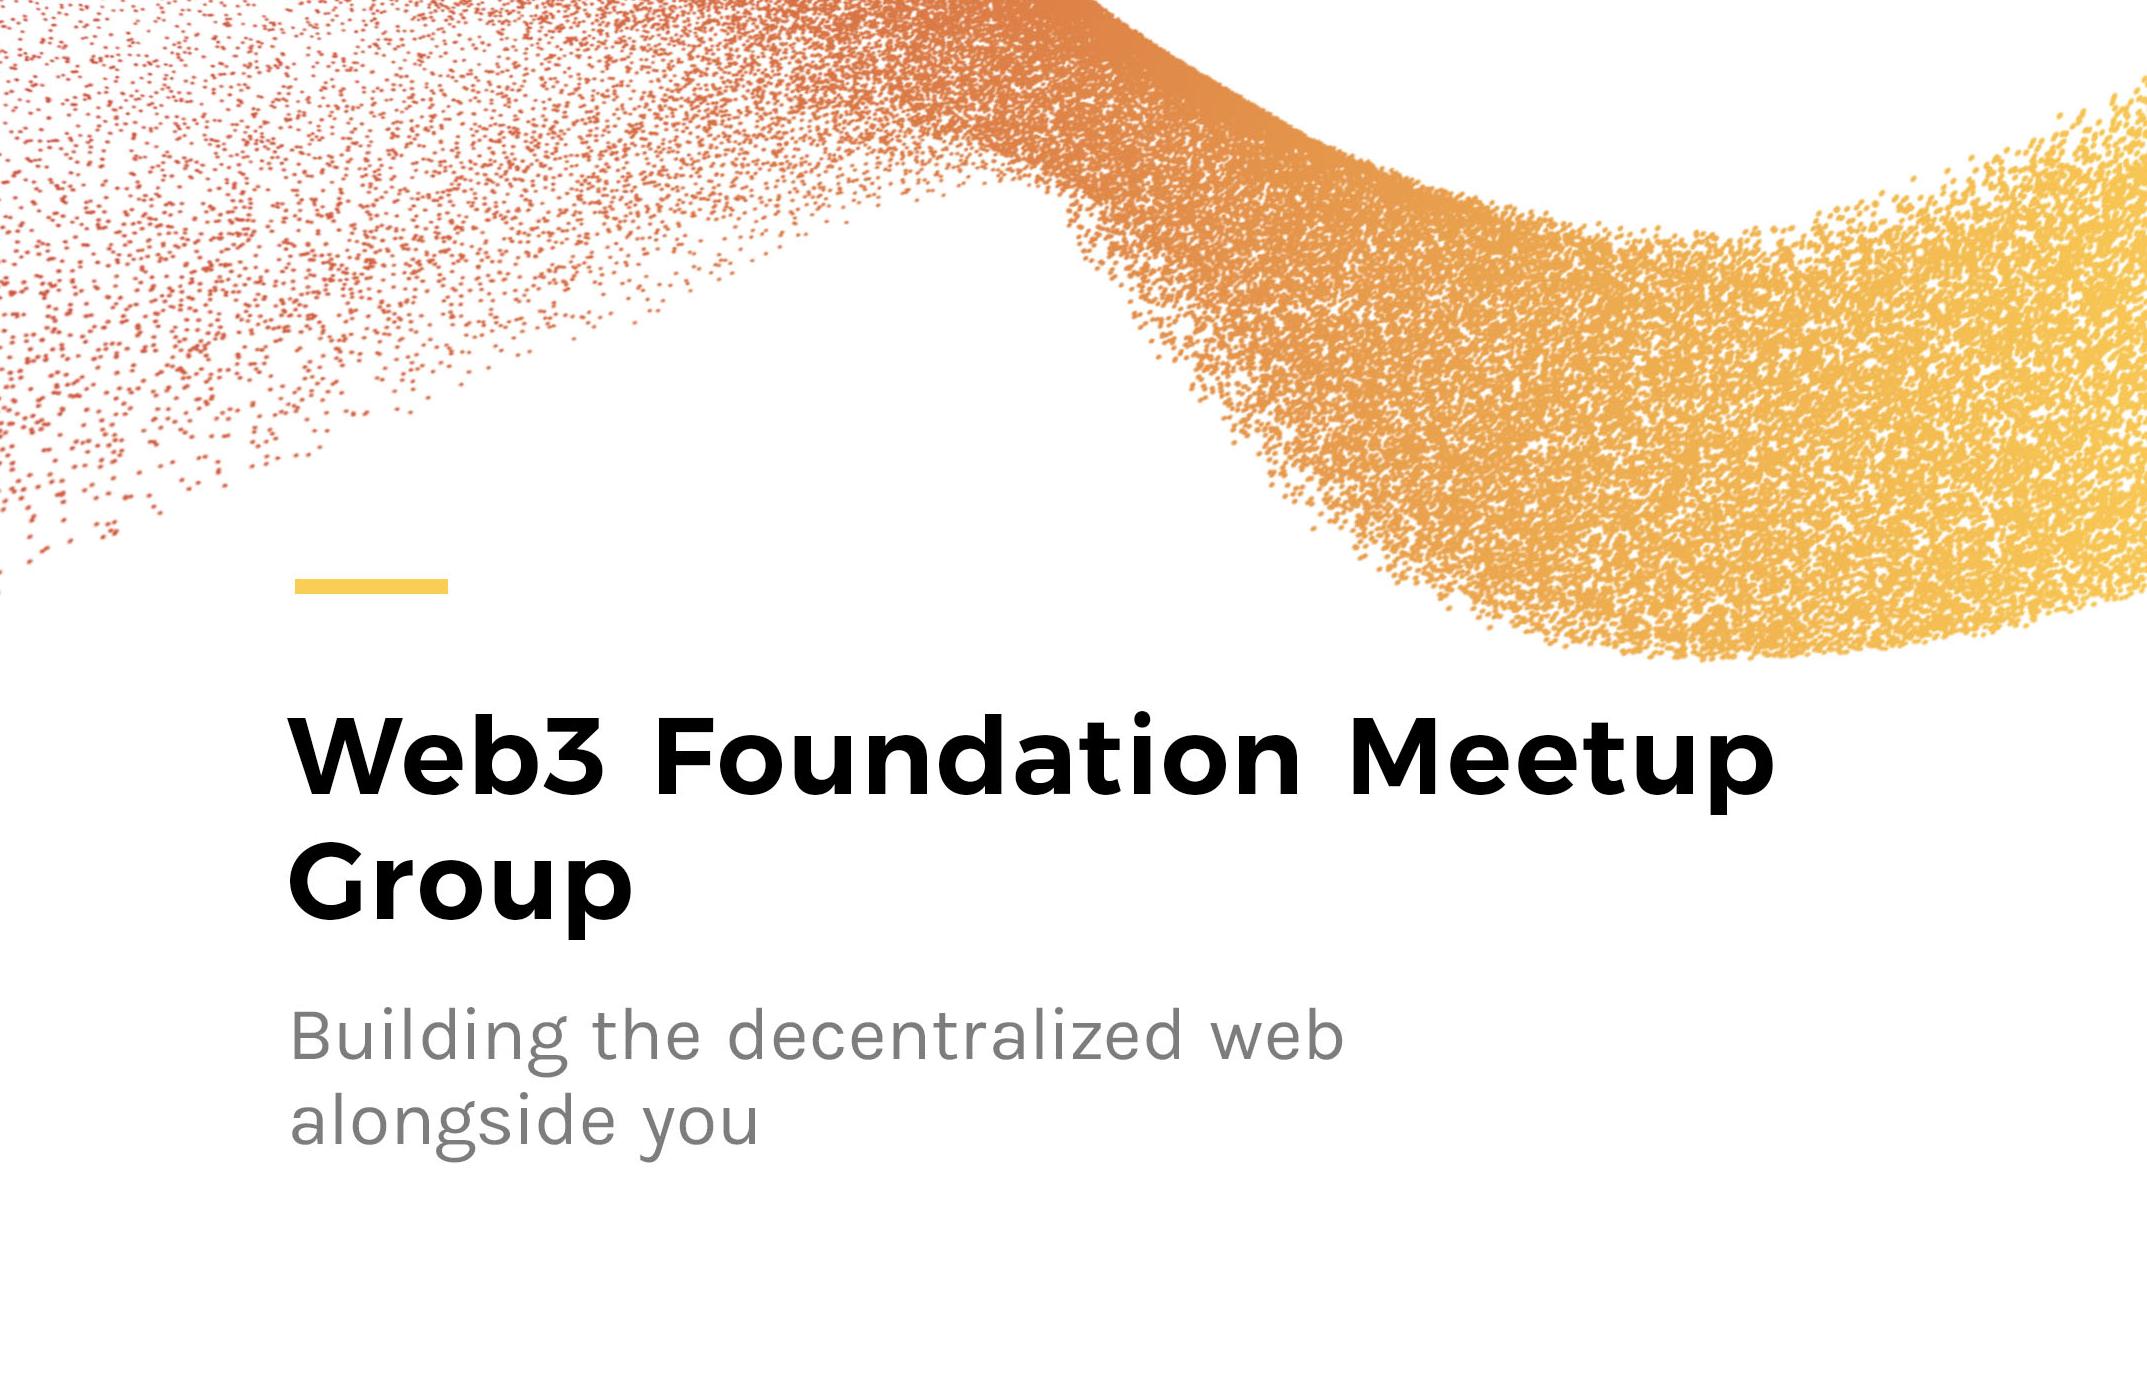 Web3 Foundation Meetup